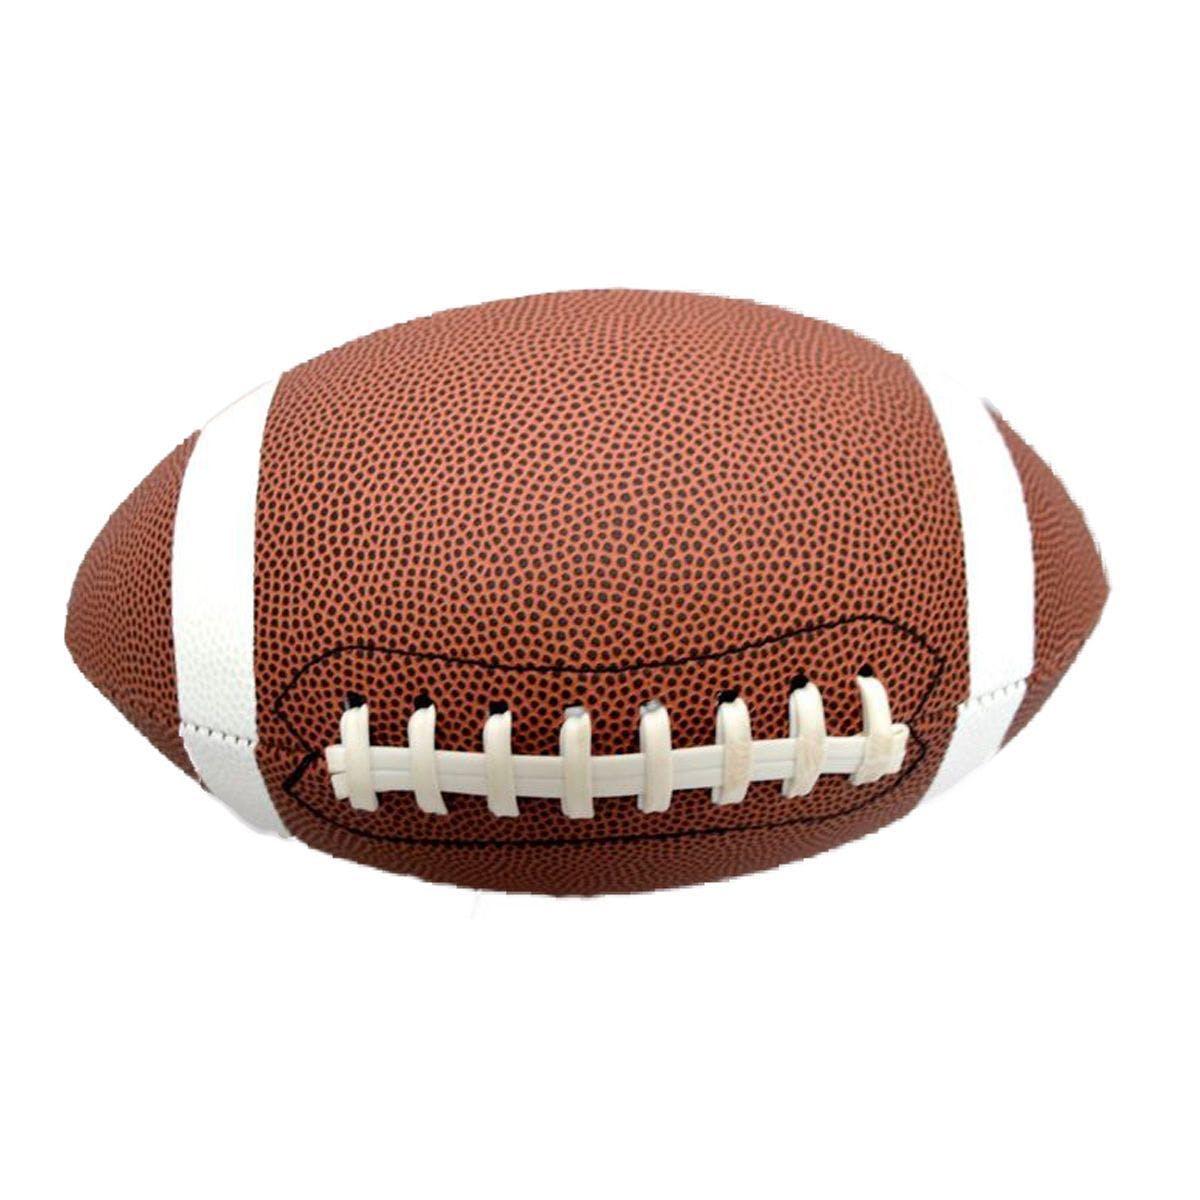 PVC Football Ball On Keychain Kids Outdoor Toy Garden Game Pocket Money Toy